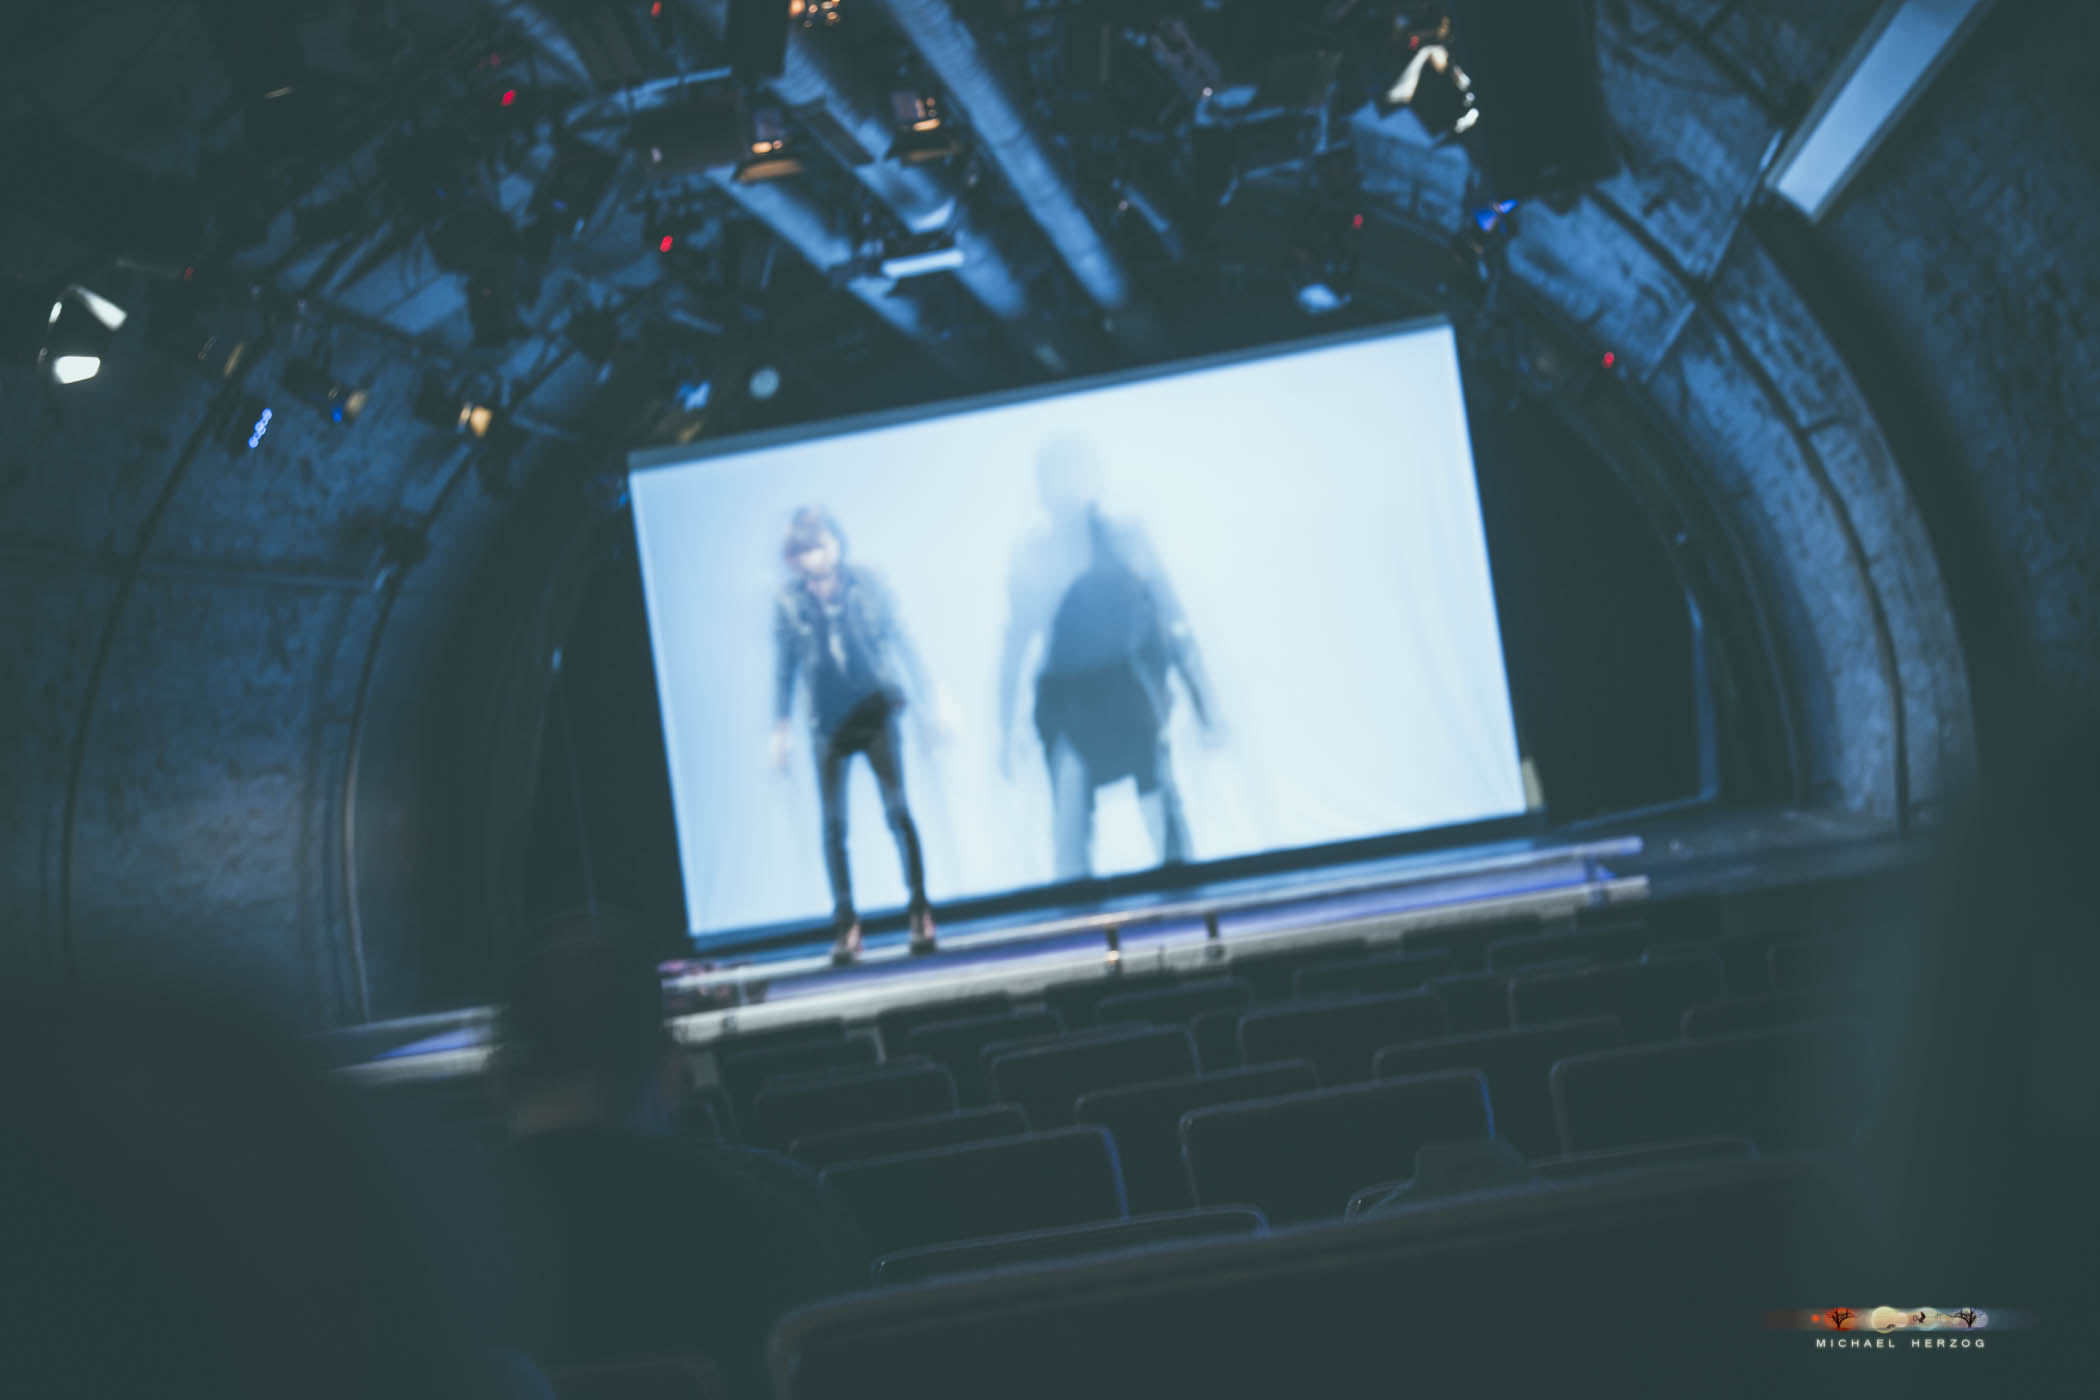 KleinesTheater_AsipJenny_MichaelHerzog_web-4585.jpg